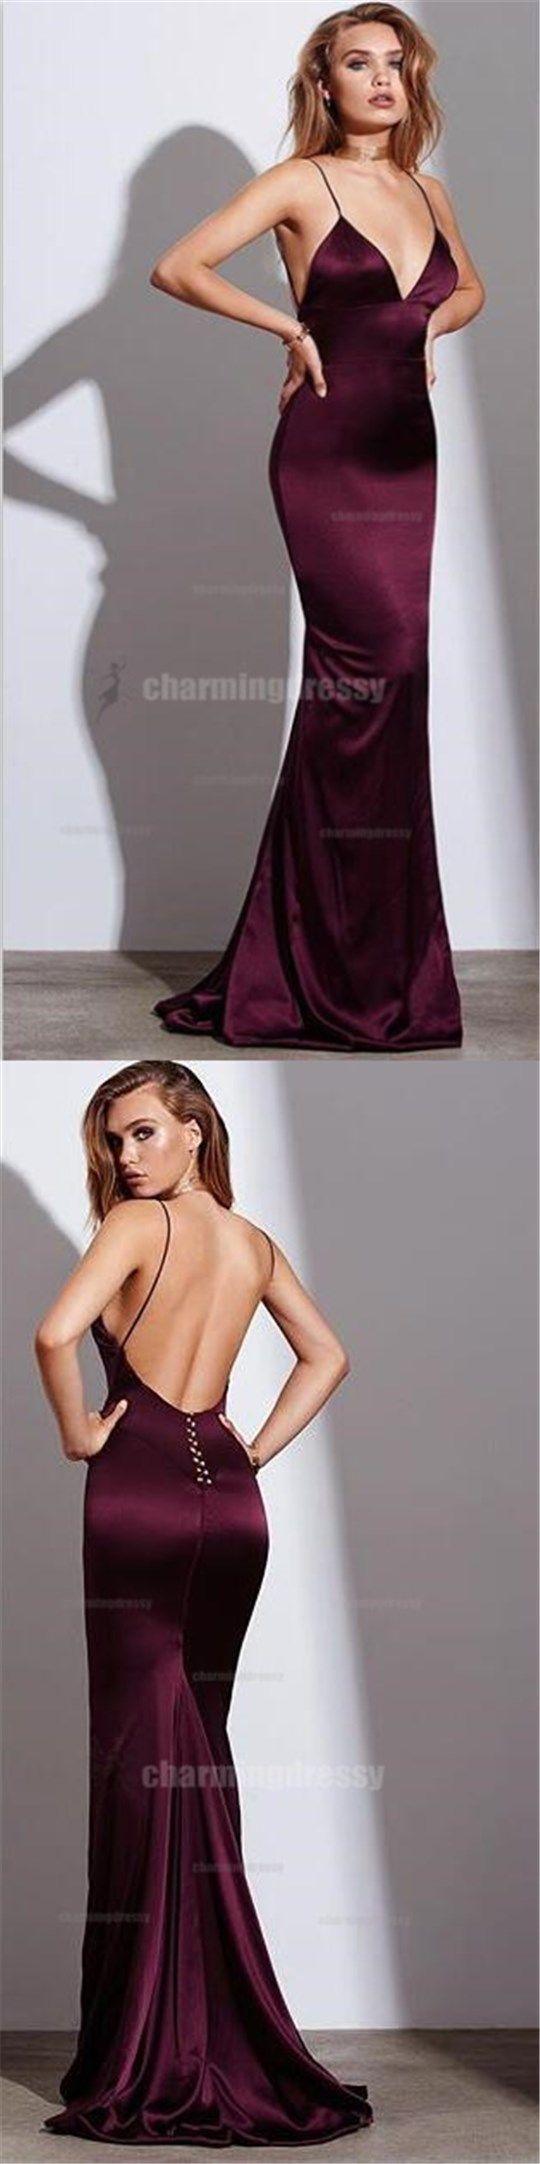 Spaghetti Straps Sexy Elegant Formal Long Cheap Fashion Charming Prom Dresses, PD0448